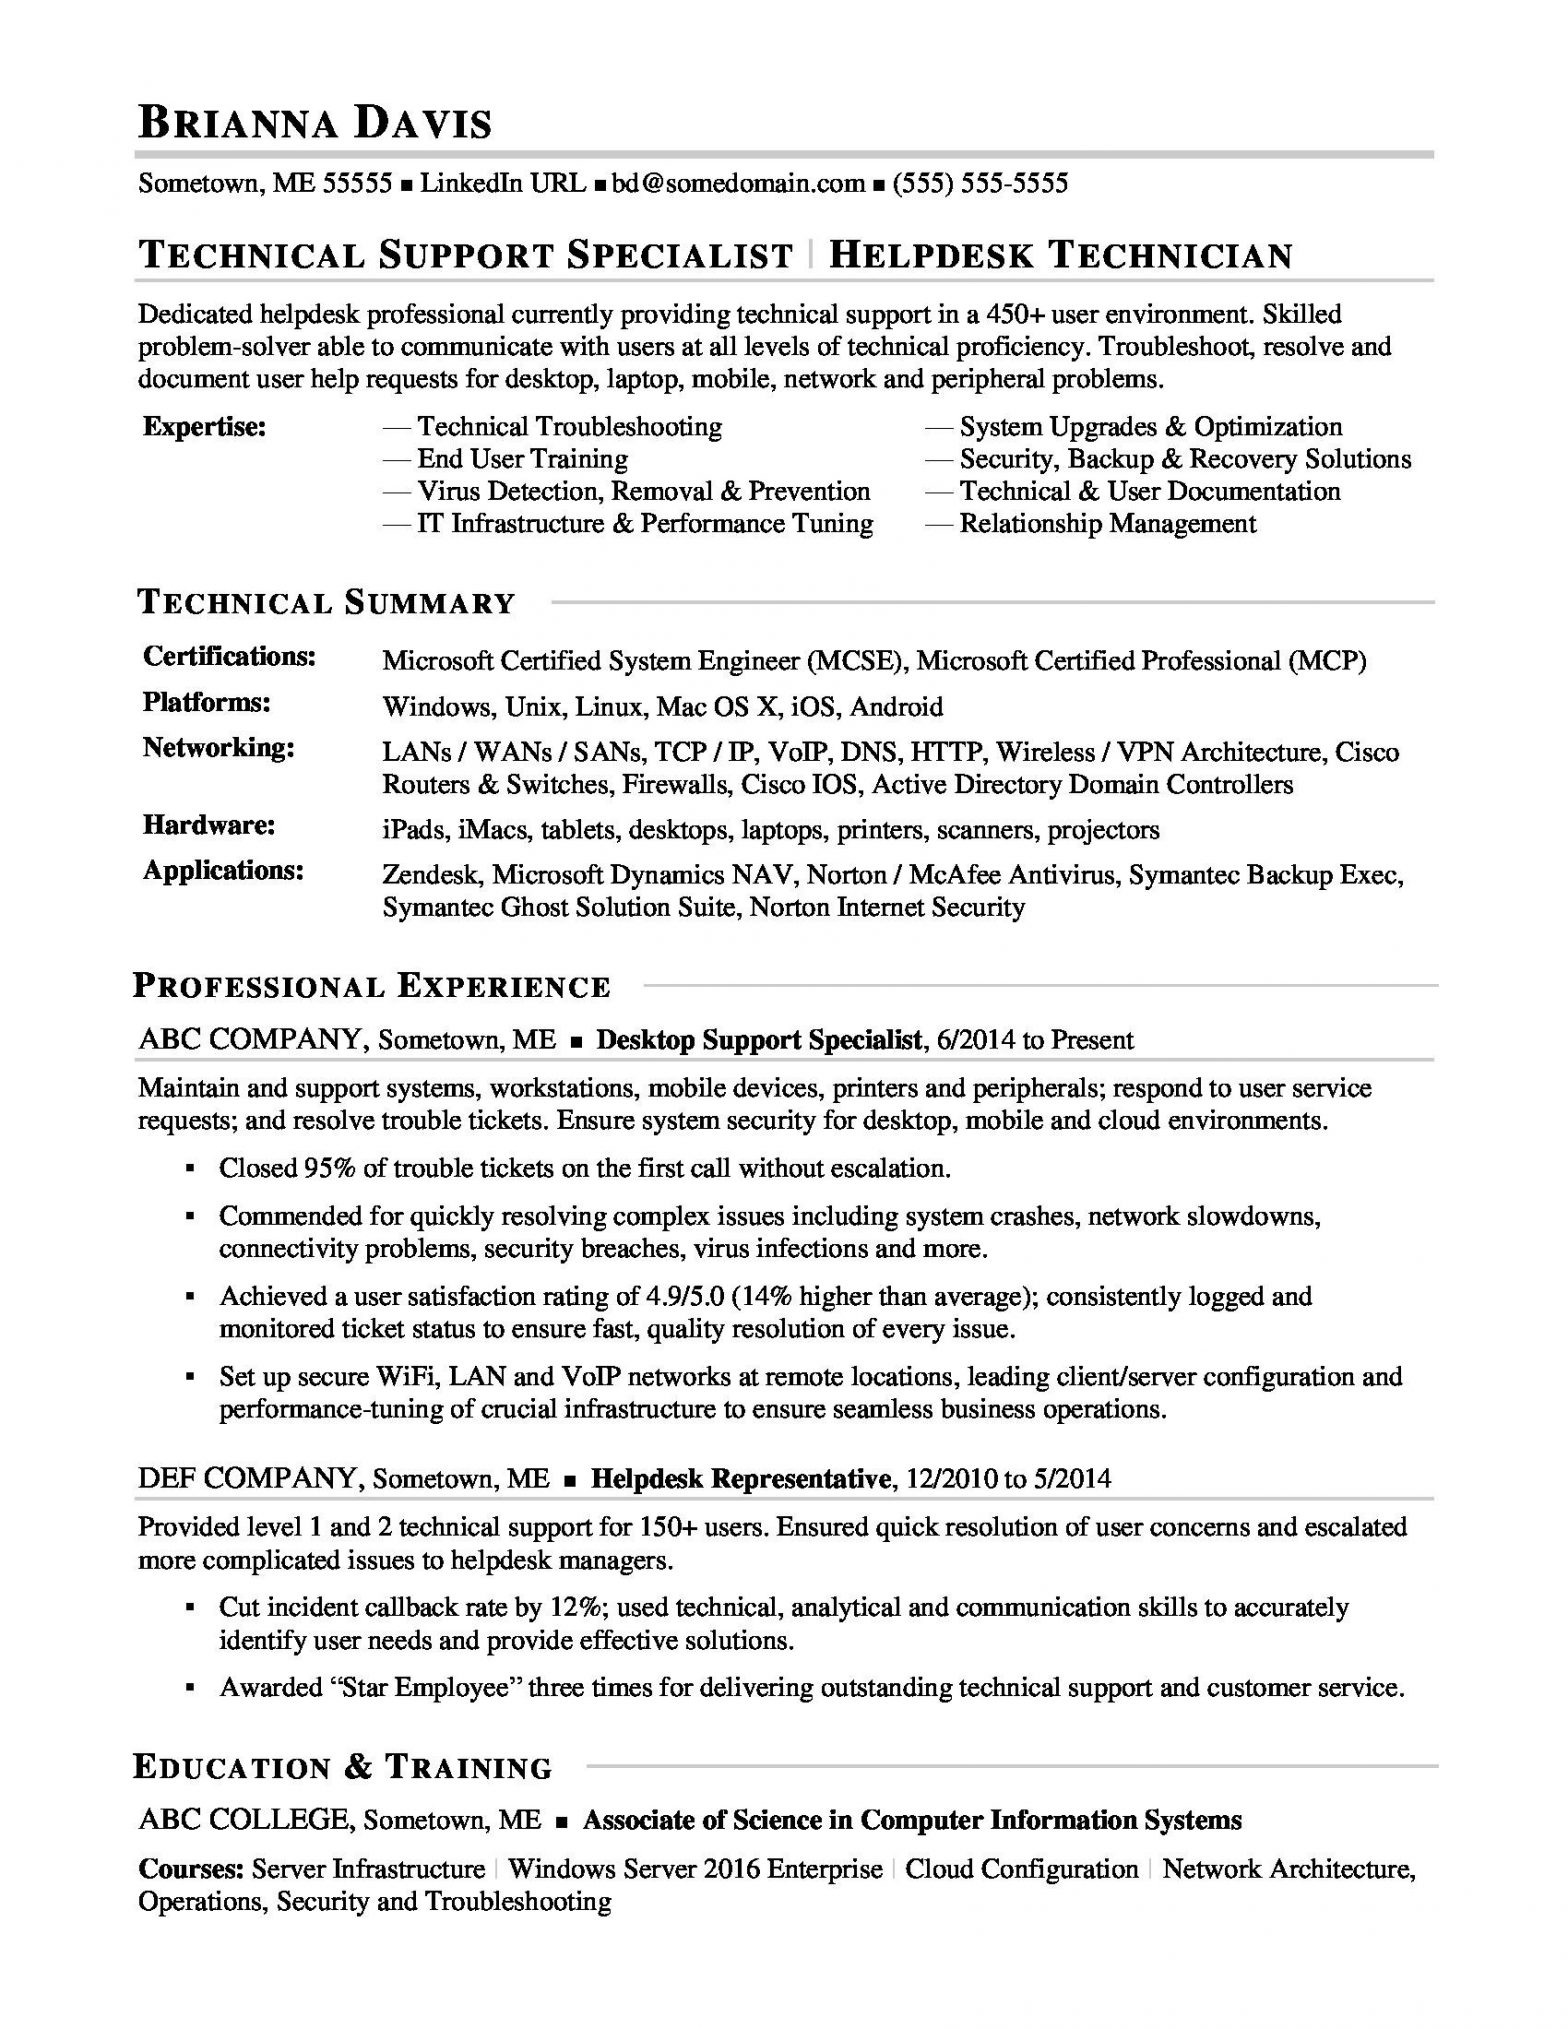 Sample Resume for It Help Desk Technician Sample Resume for Experienced It Help Desk Employee Monster.com